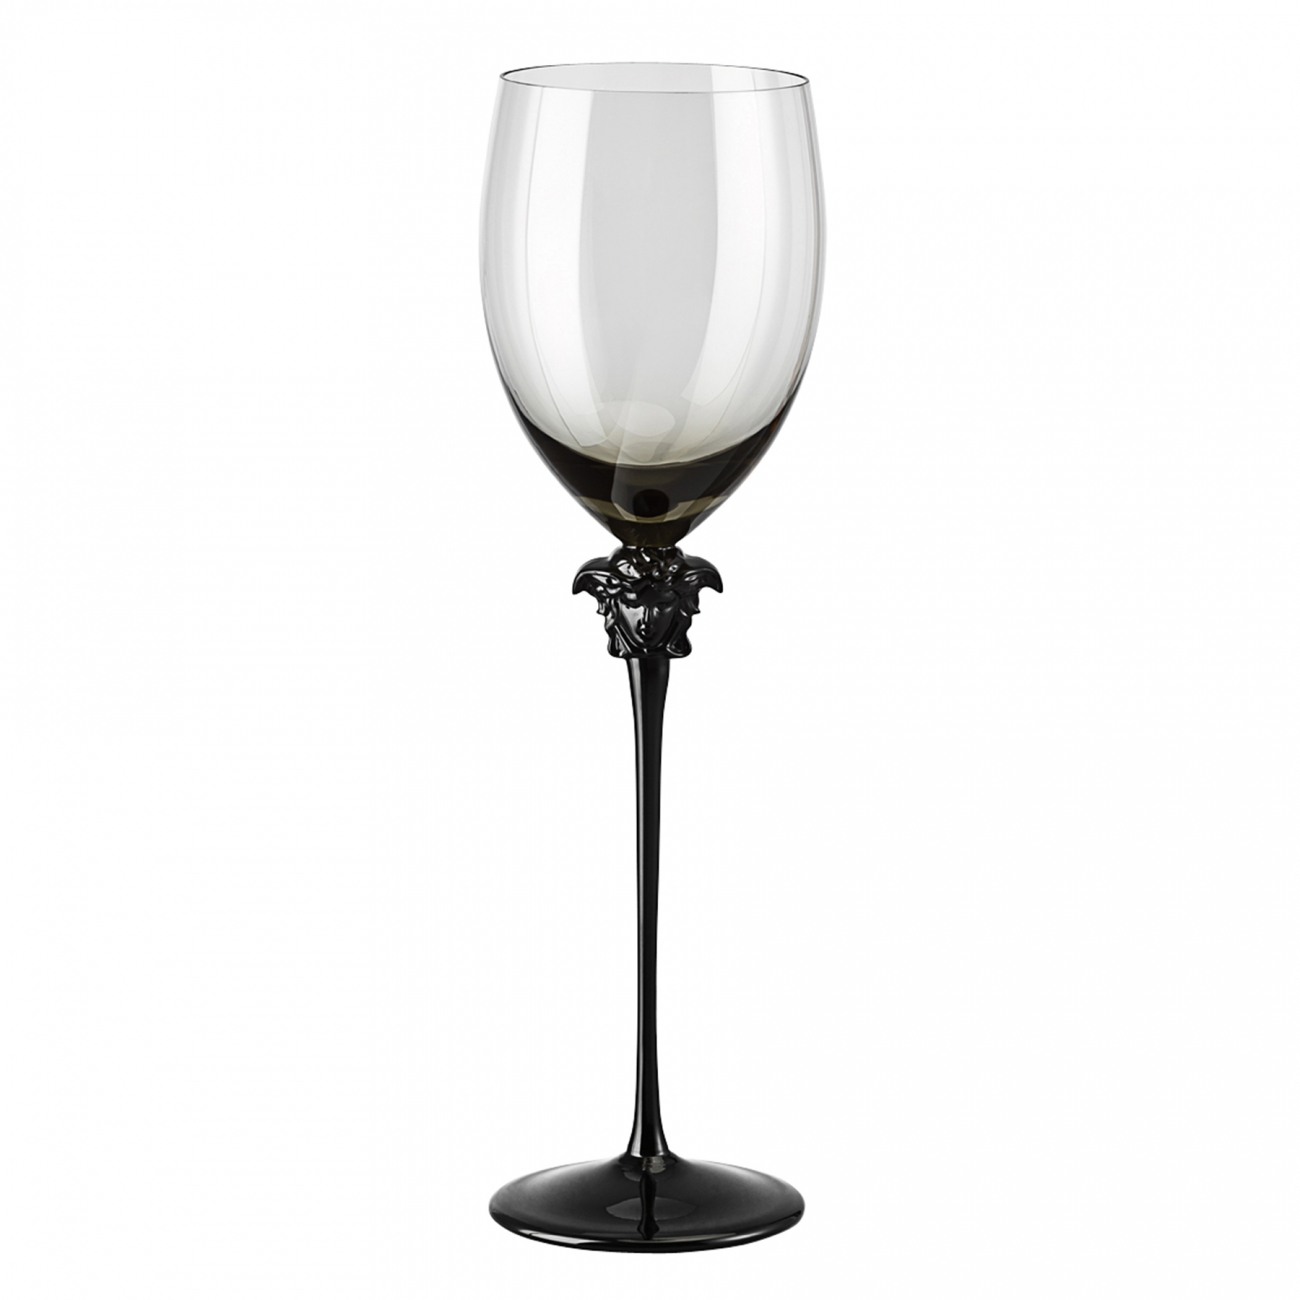 Rosenthal Versace Medusa Lumière Haze Red wine Goblet